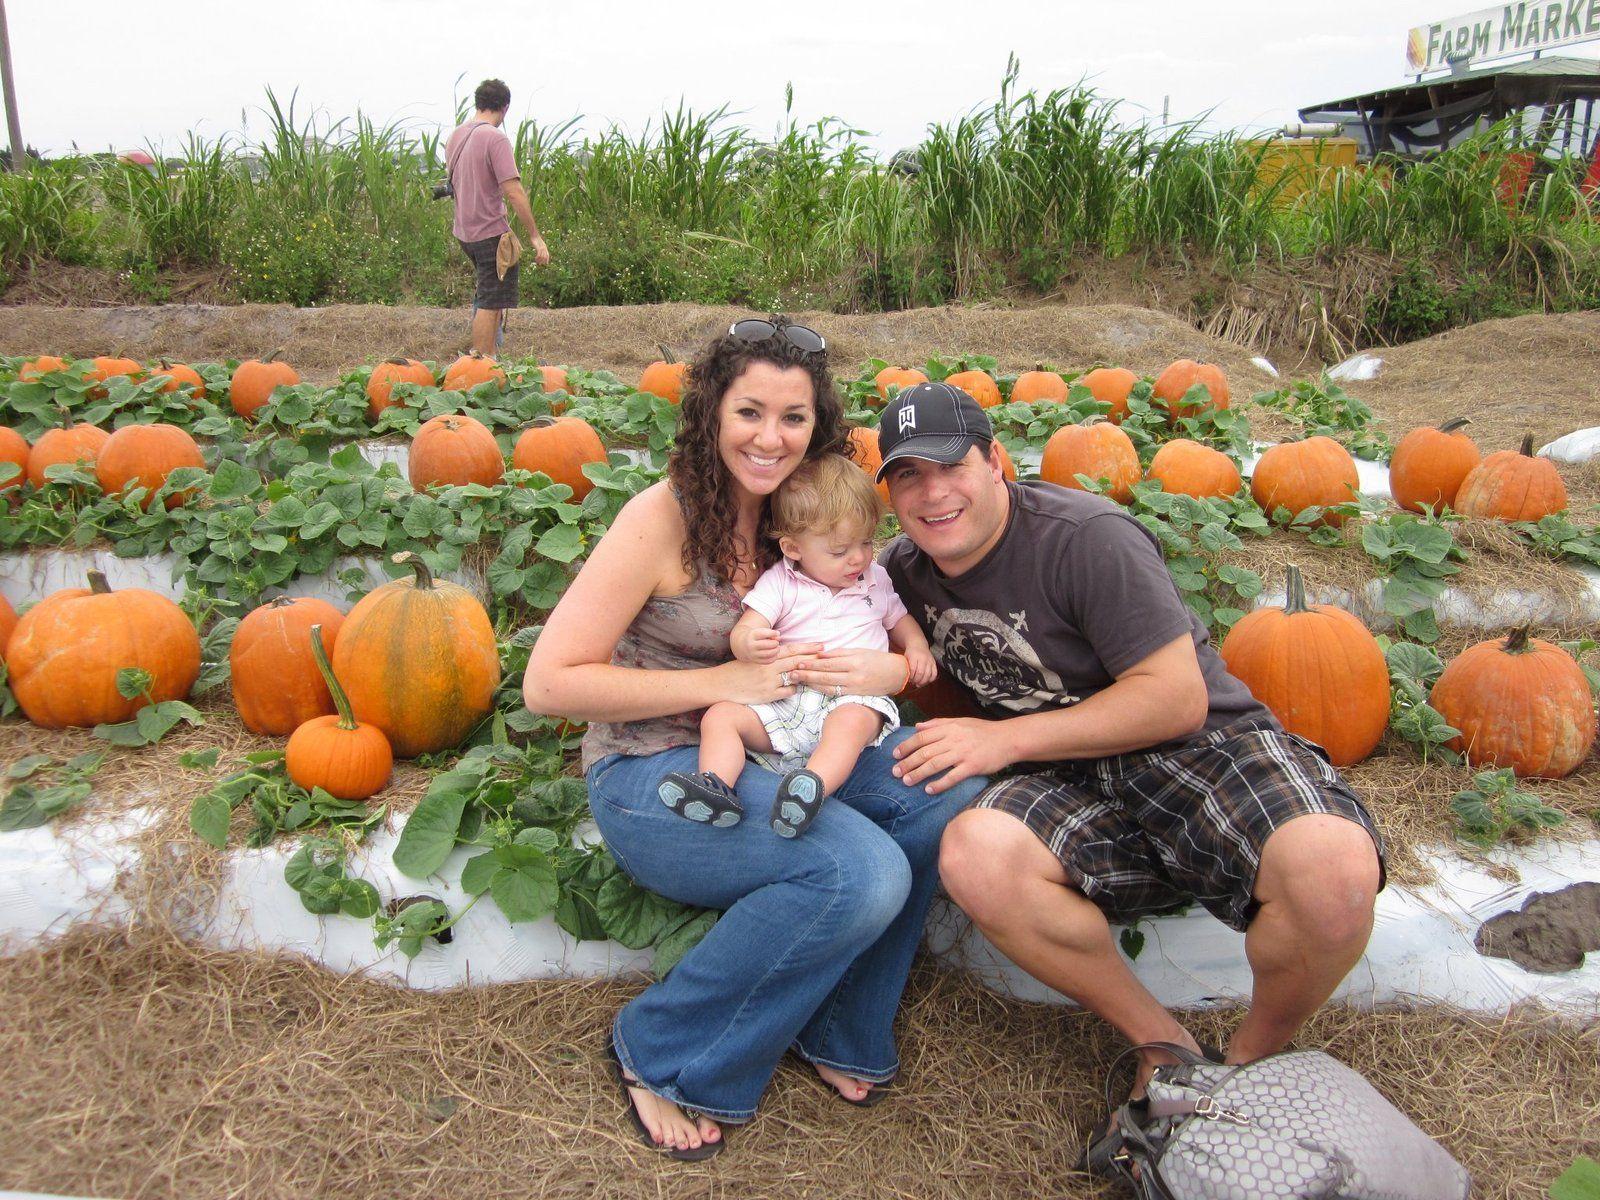 Bedner 39 S Farm Fresh Market Boynton Beach Fl Kid Friendly Activ Trekaroo Fall Family